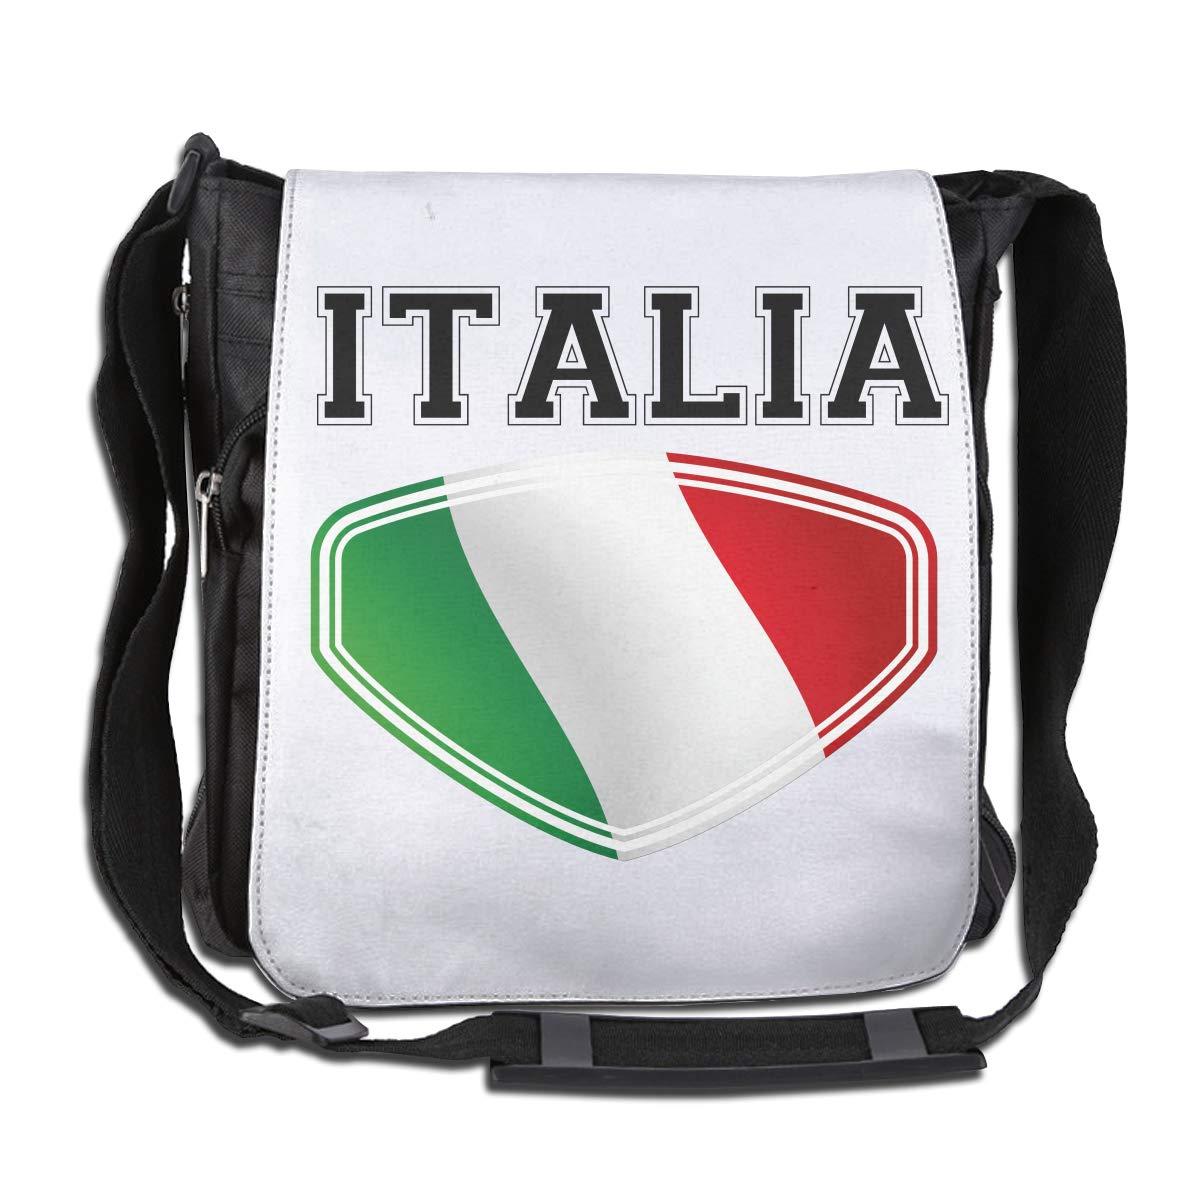 LRHUI Italia Italy Italian Flag Unisex Multifunction Narrow Single Shoulder Bag Diagonal School Bag